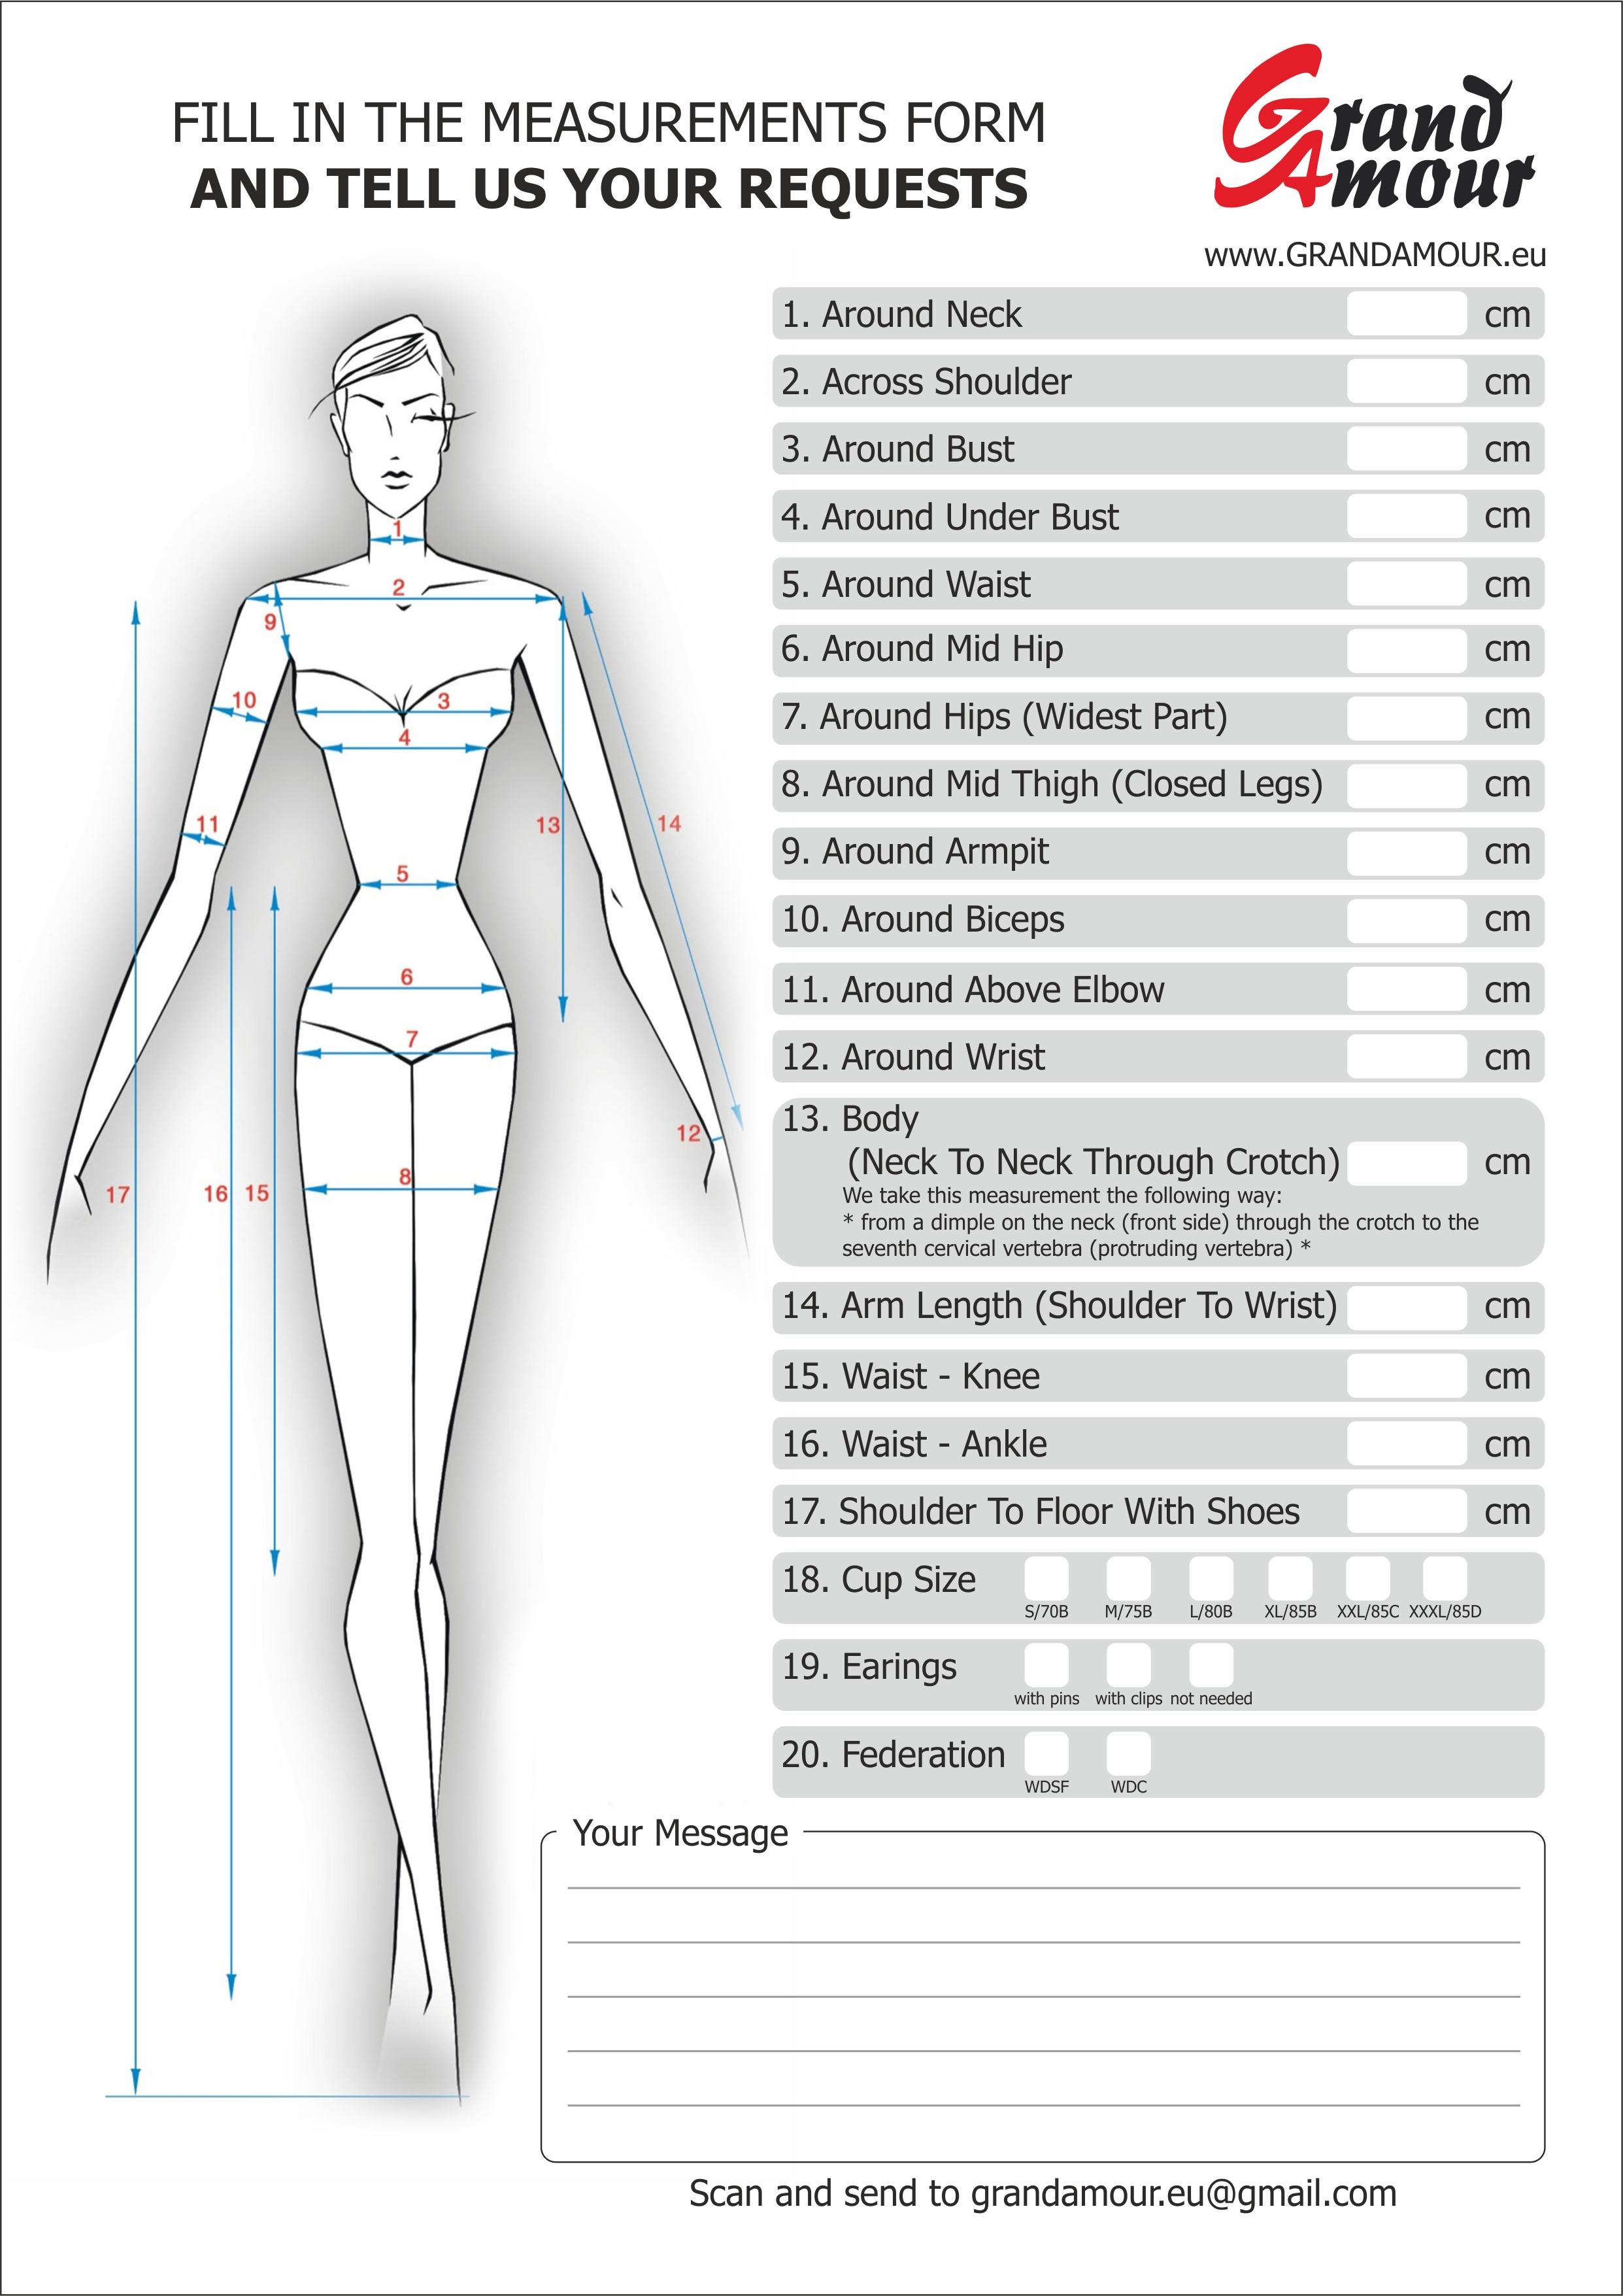 Measurements Form Grand Amour Eu The Best Dresses For